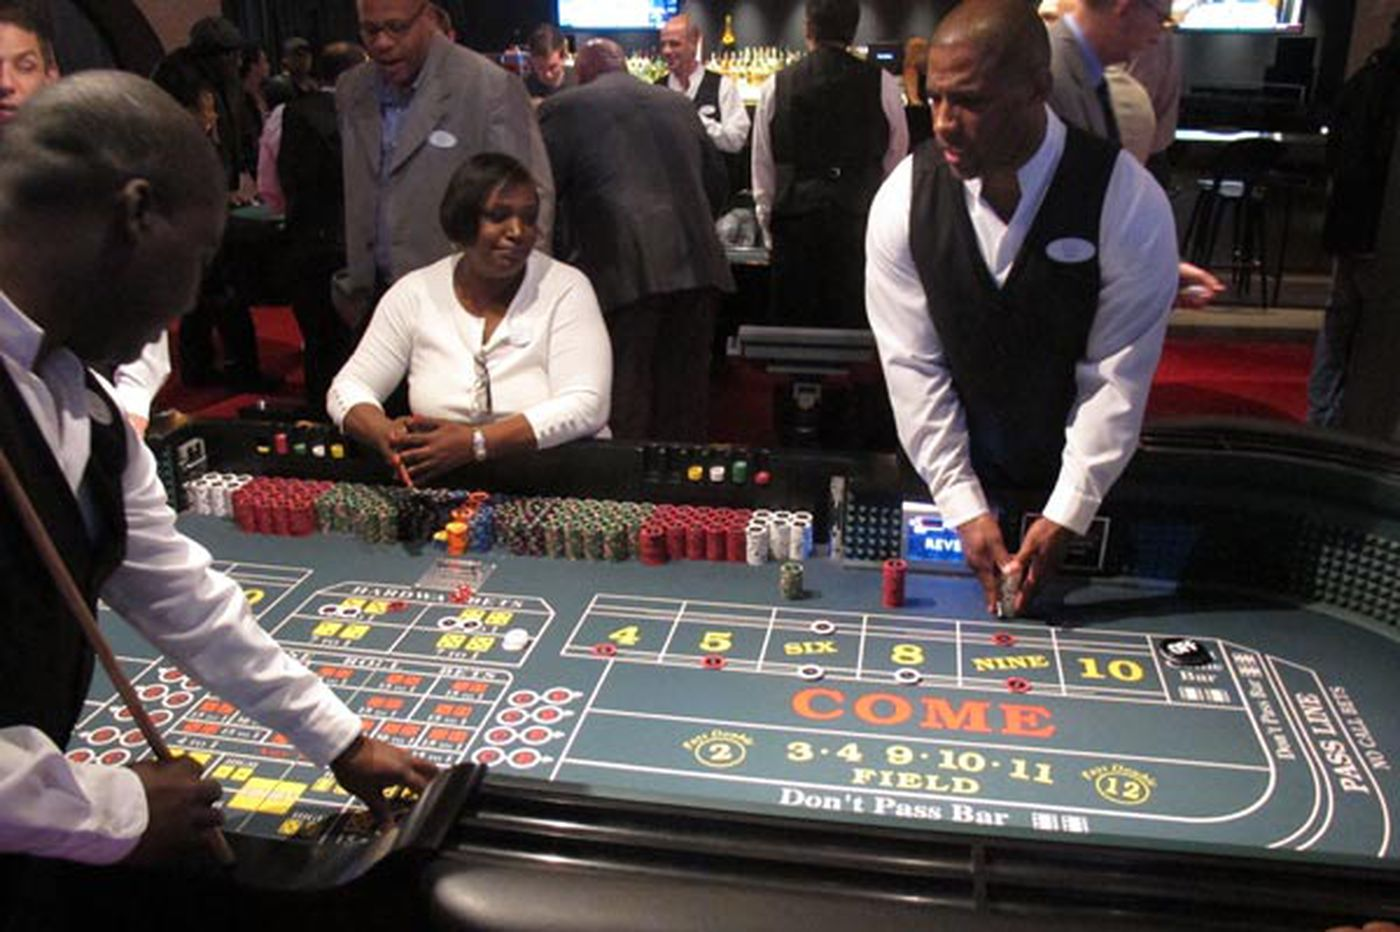 Casino news com helsinki casino sports bar